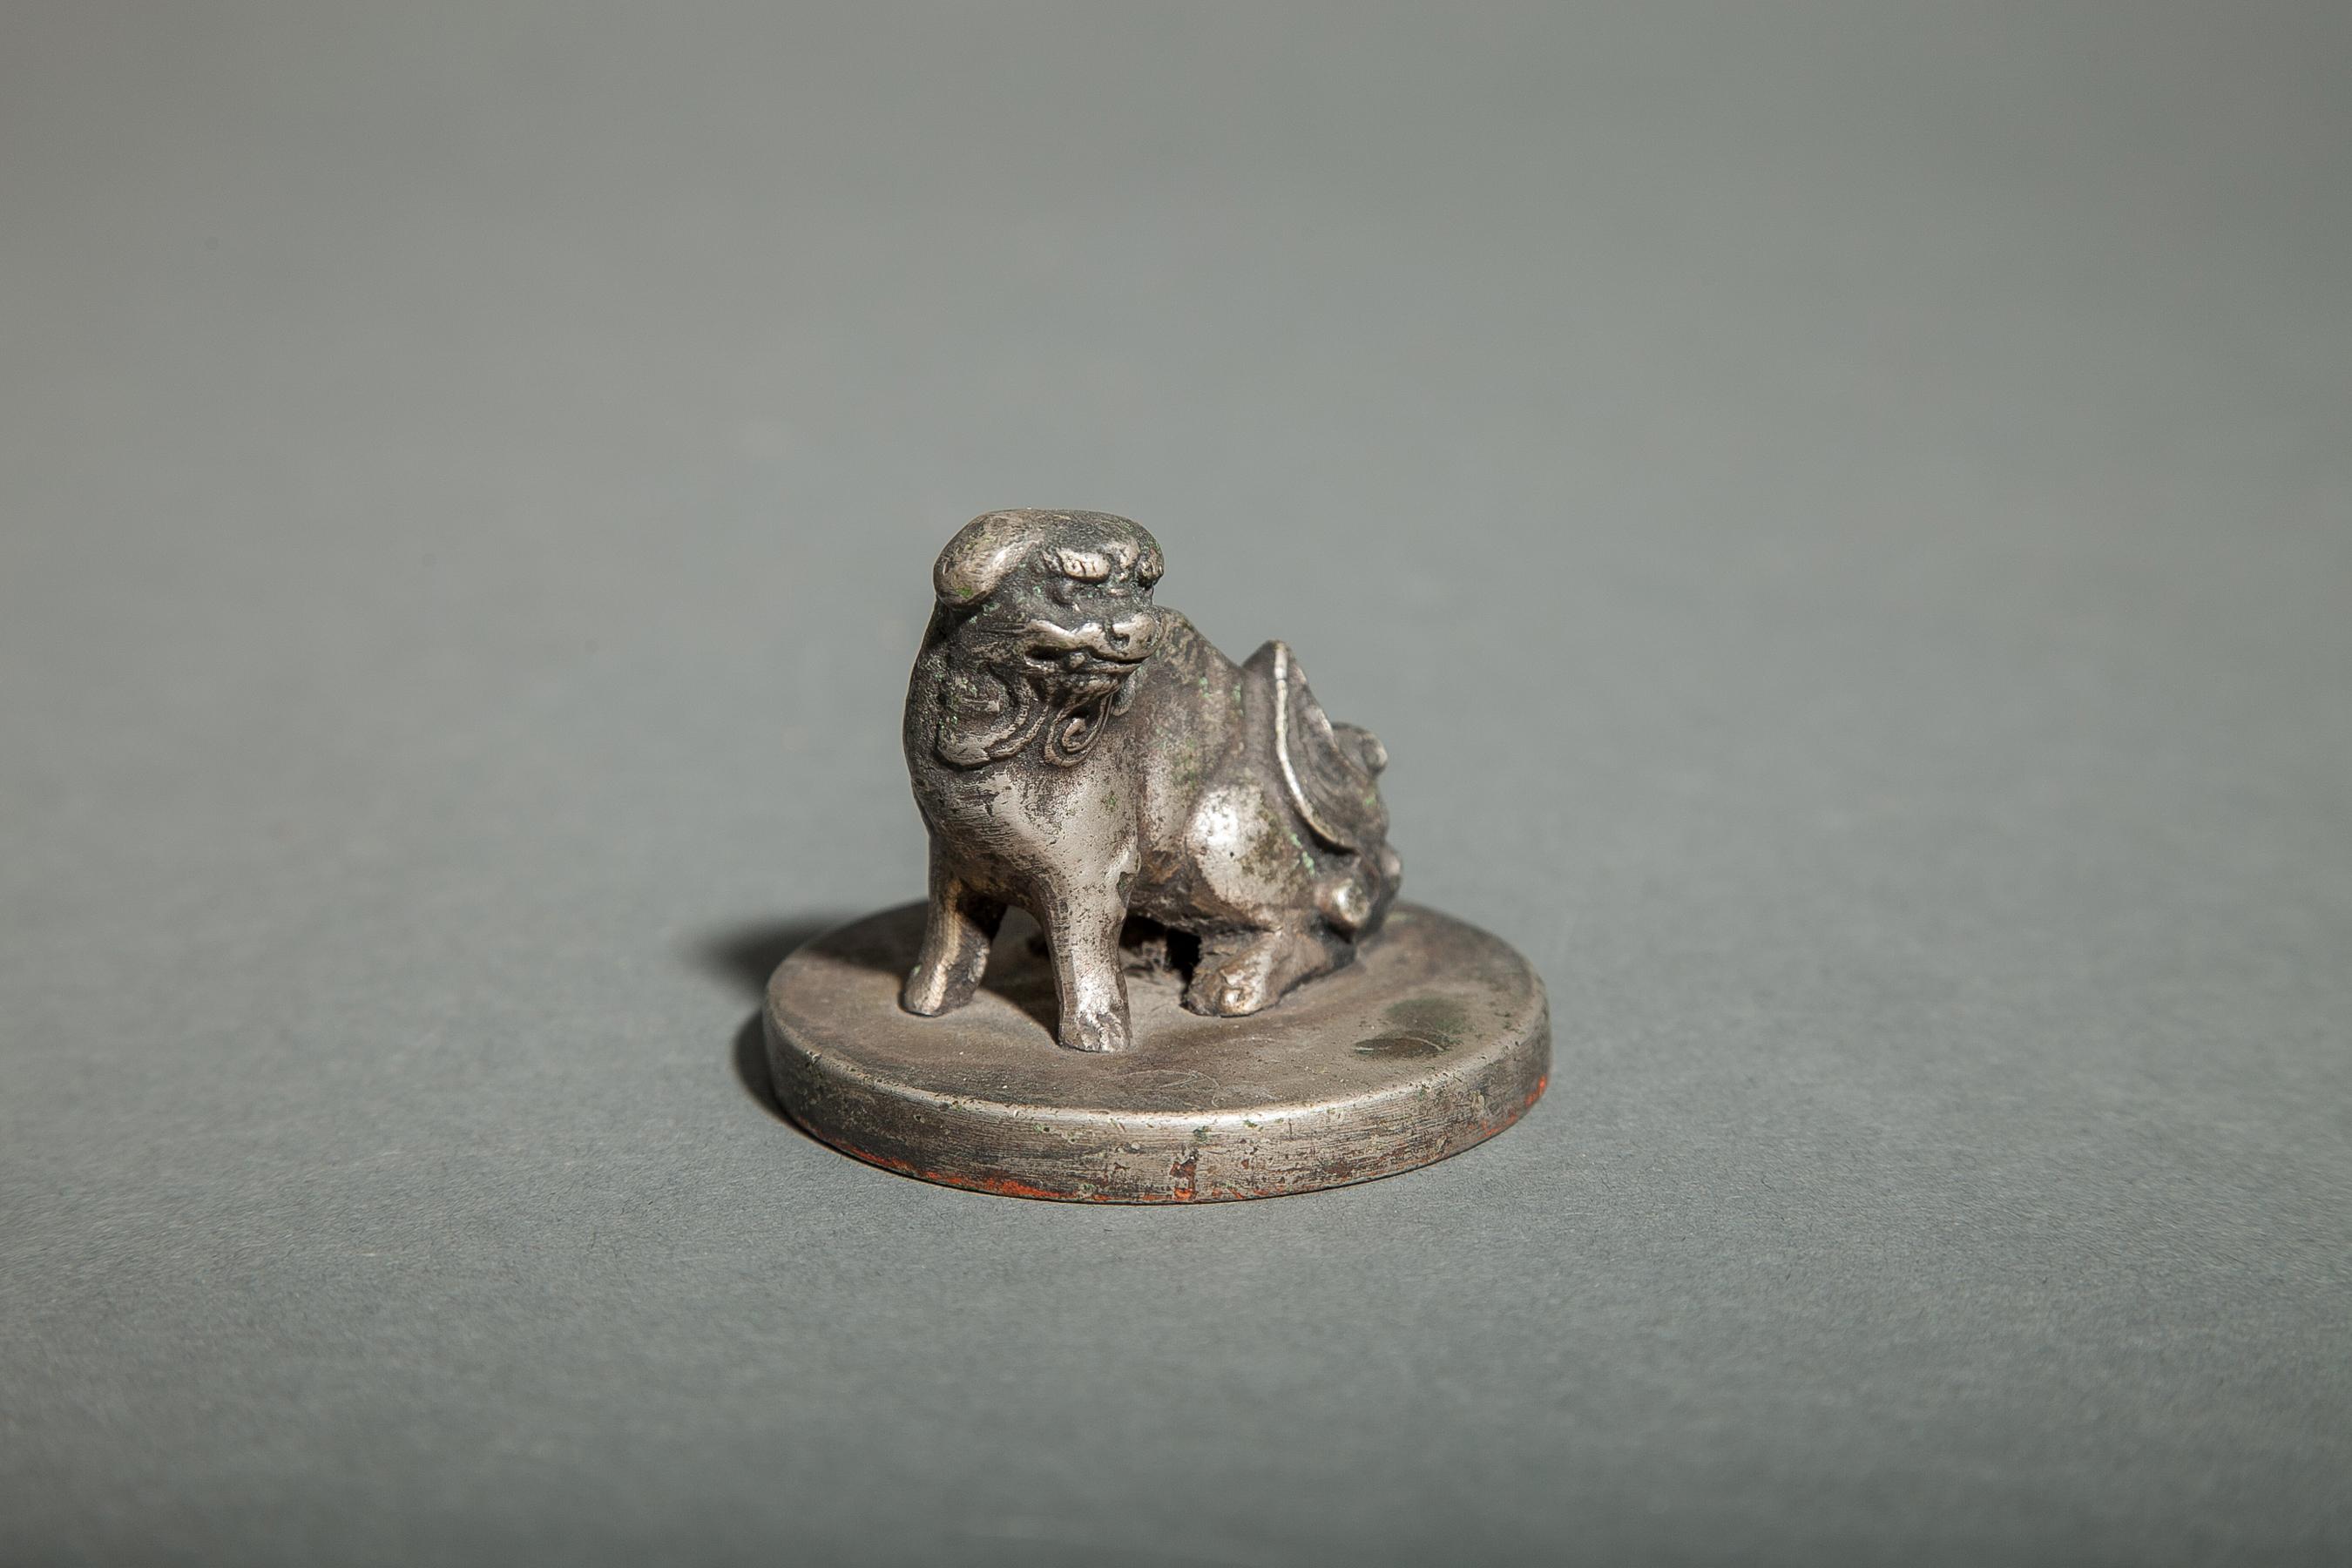 Chinese Paktong ShiShi (Lion Dog) Seal